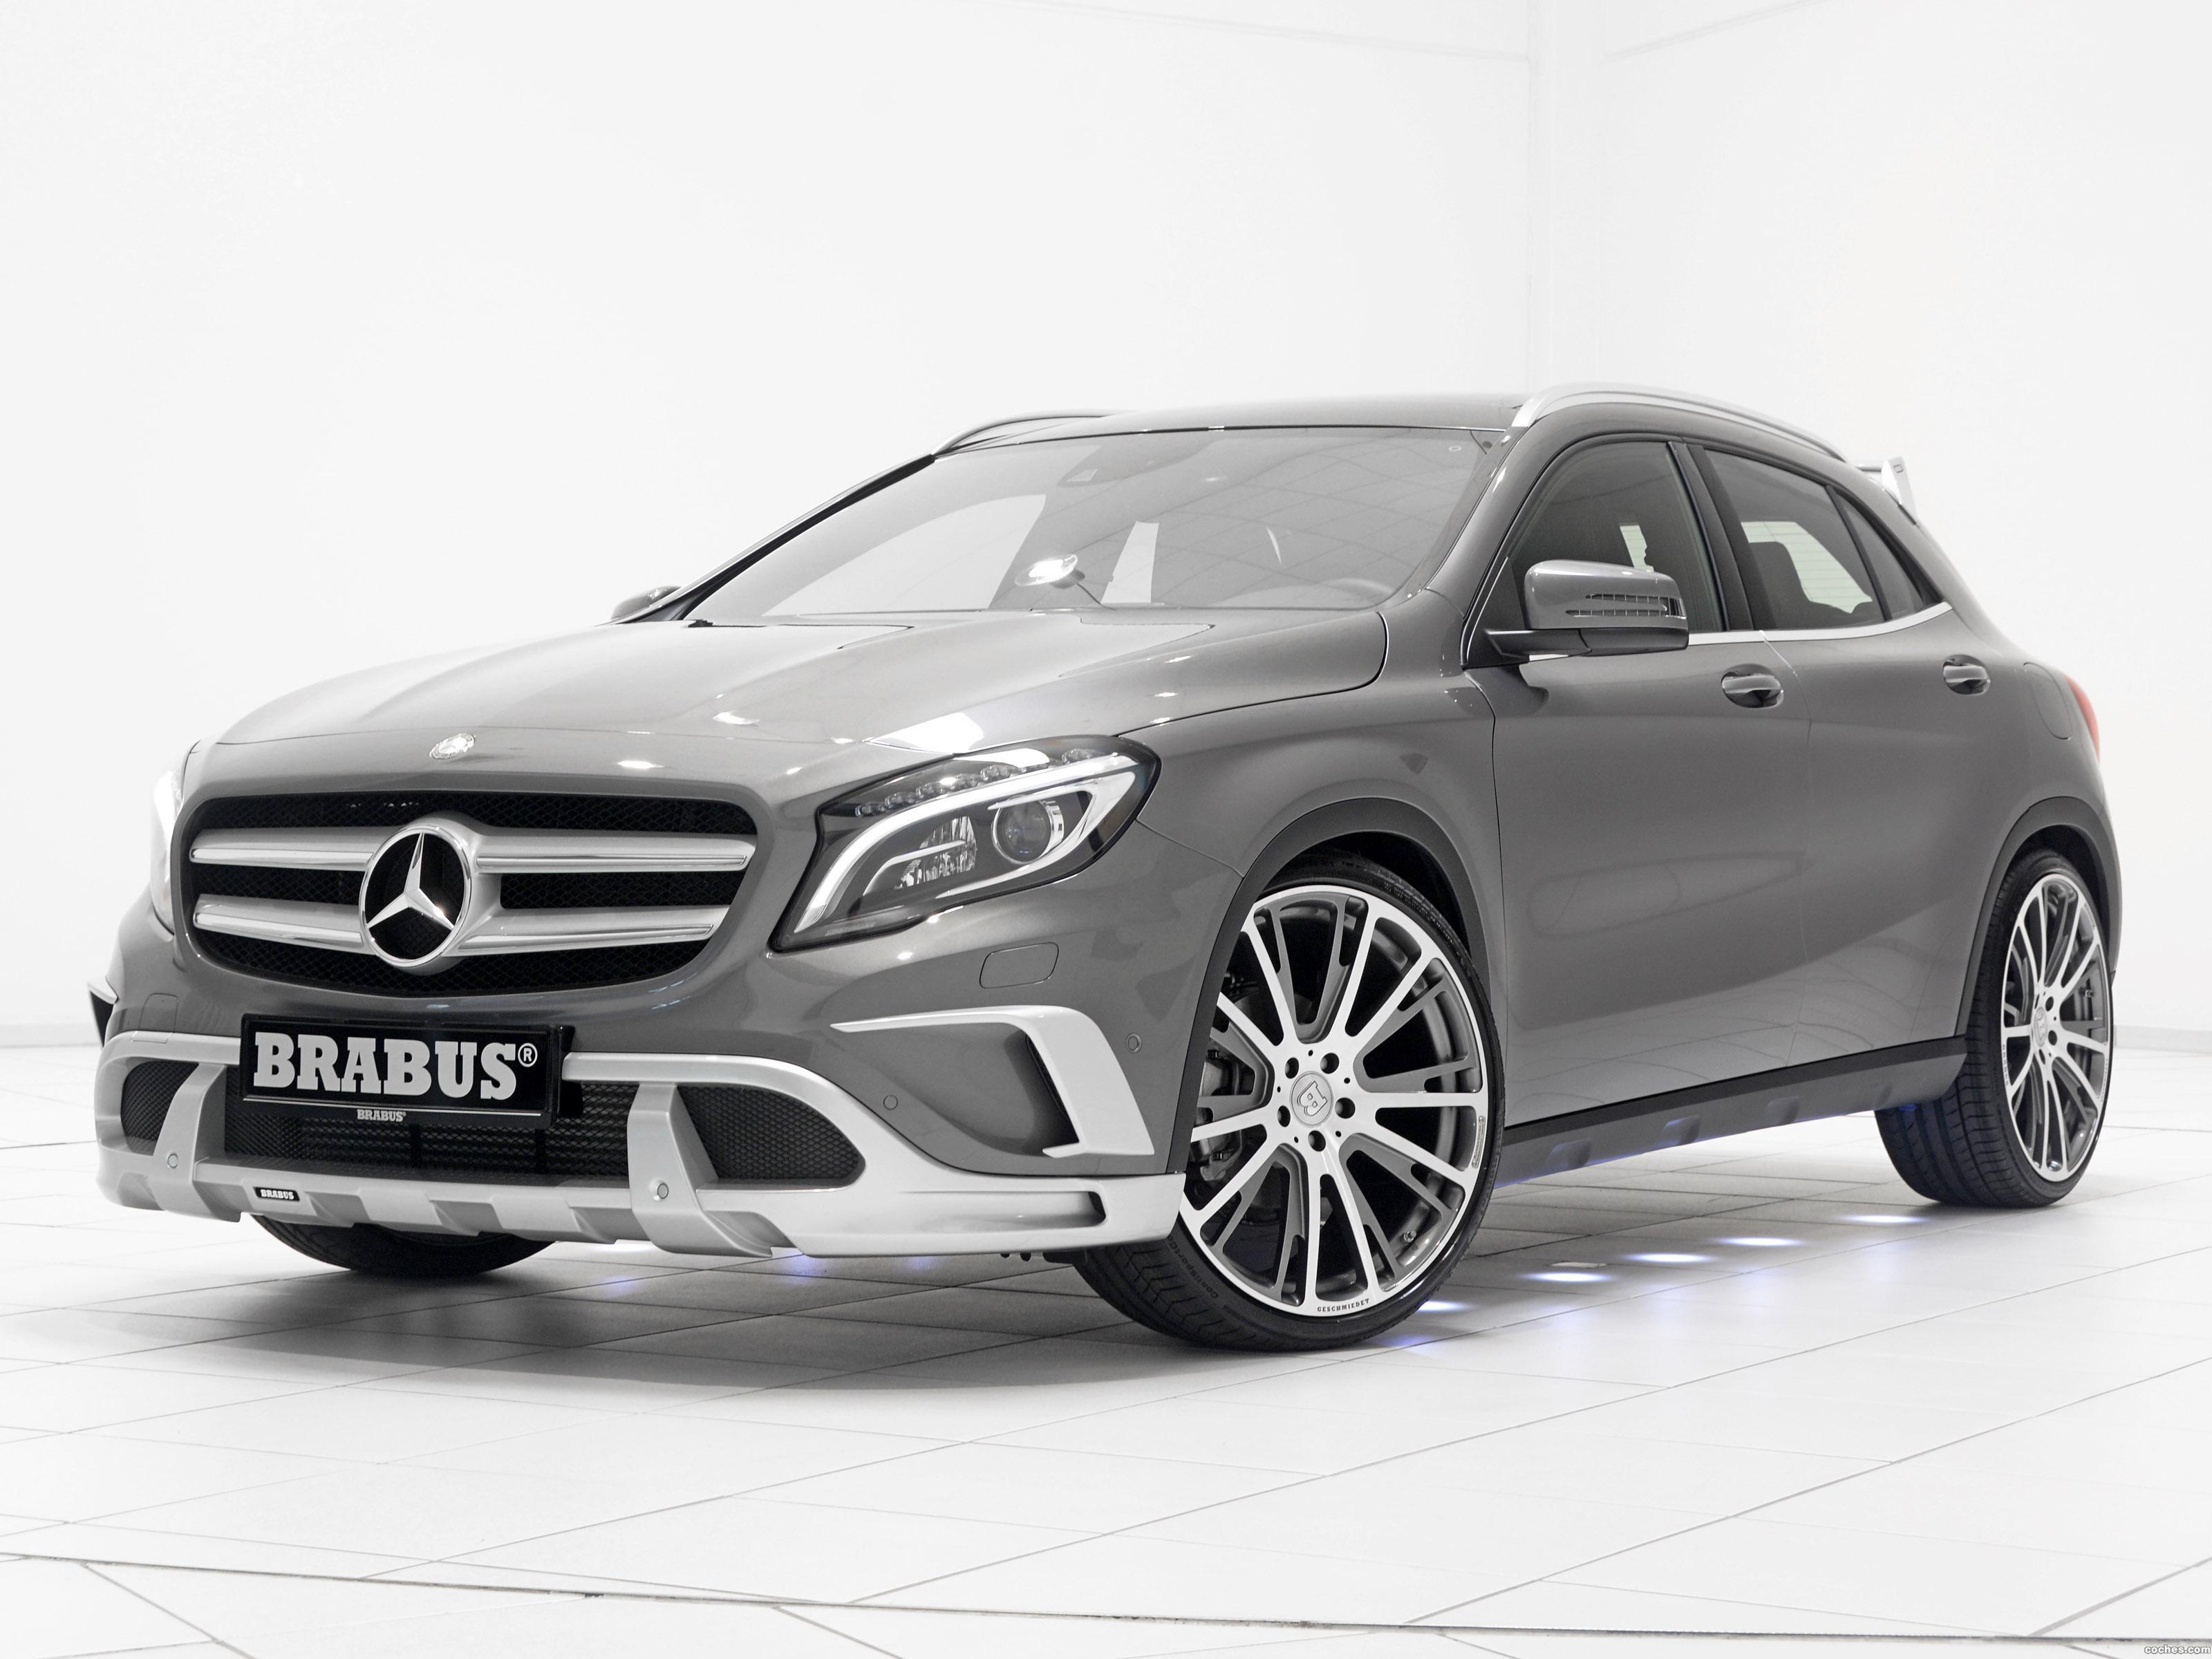 Foto 0 de Brabus Mercedes Clase GLA 220 CDI X156 2014